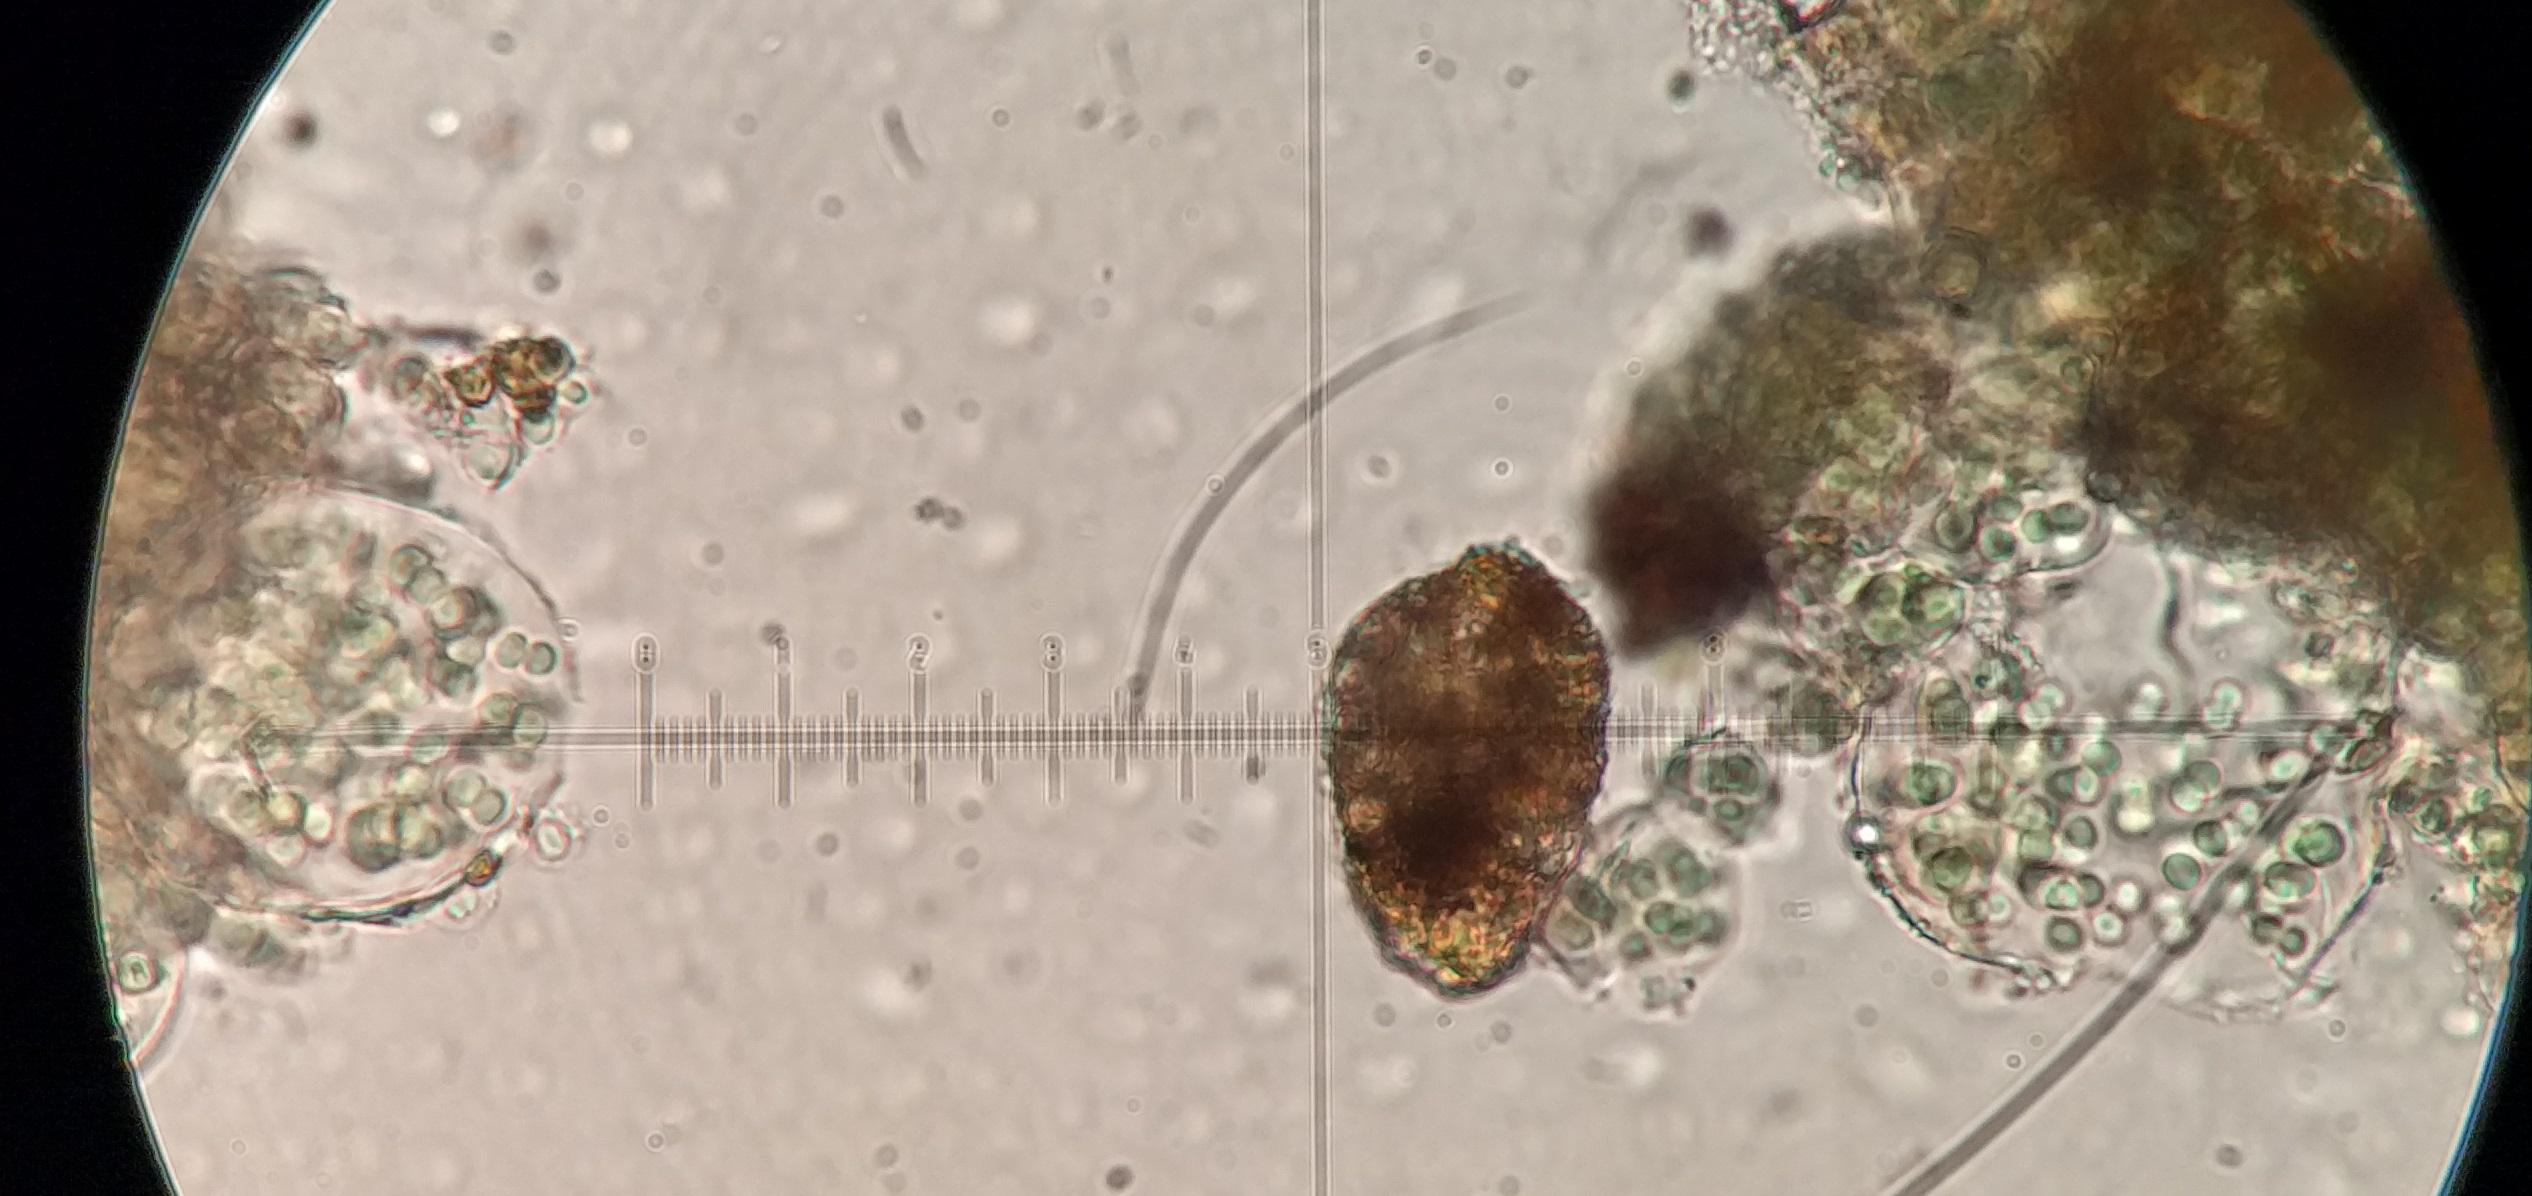 Agonimia globulifera spores